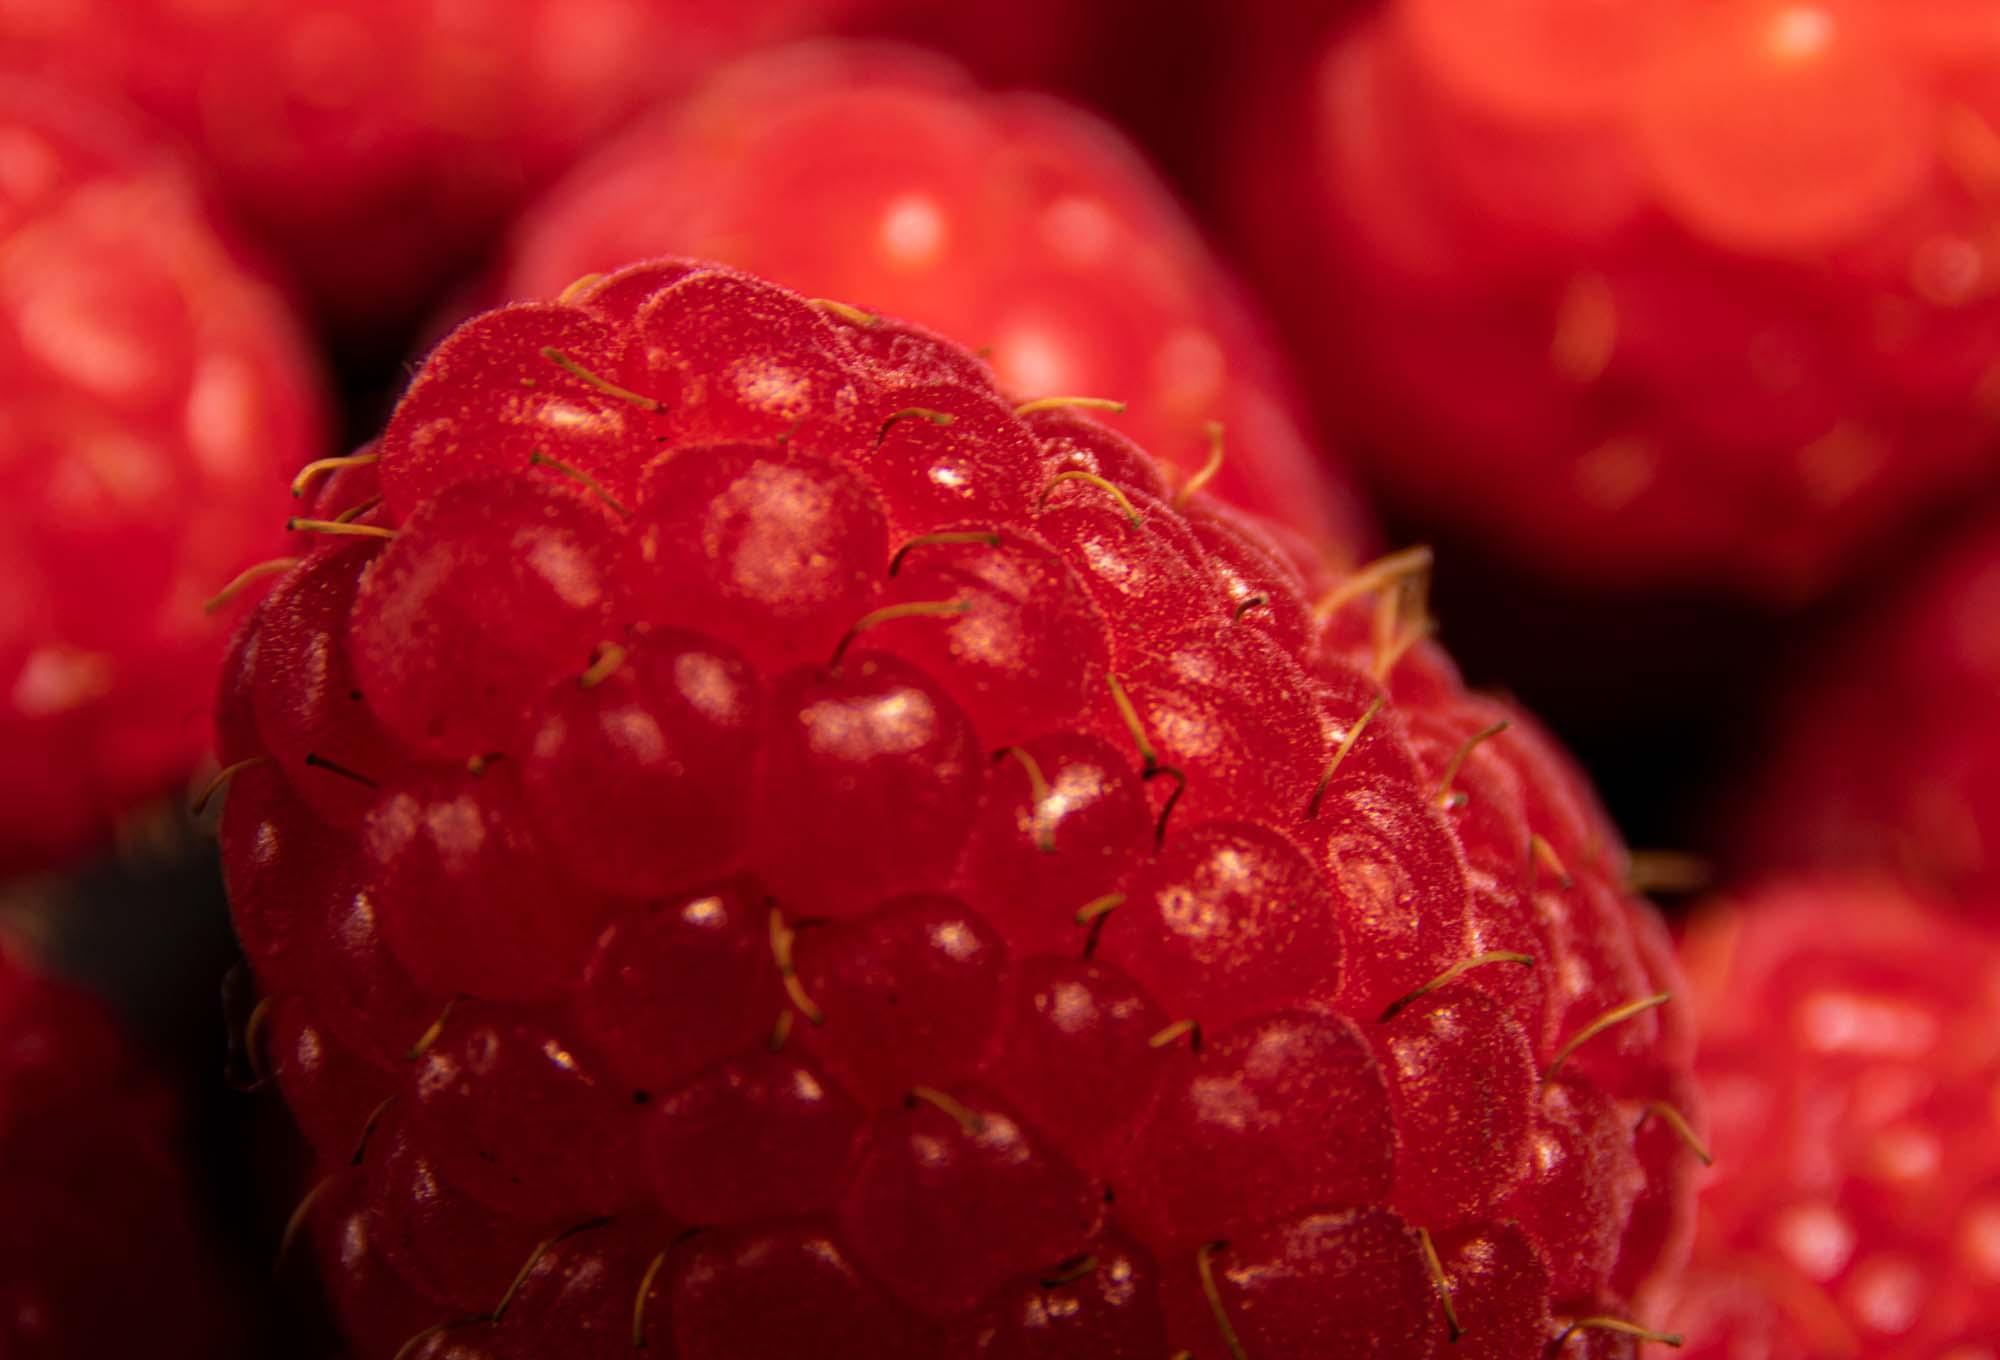 macro photography of raspberries on black background